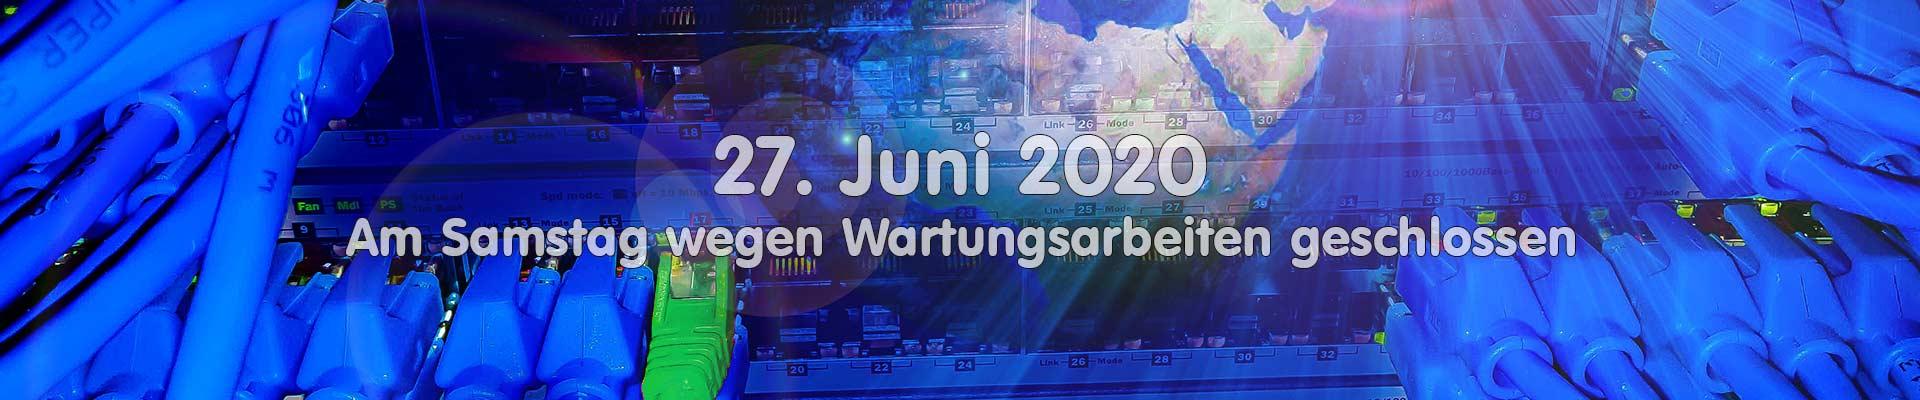 Wartung 27. Juni 2020